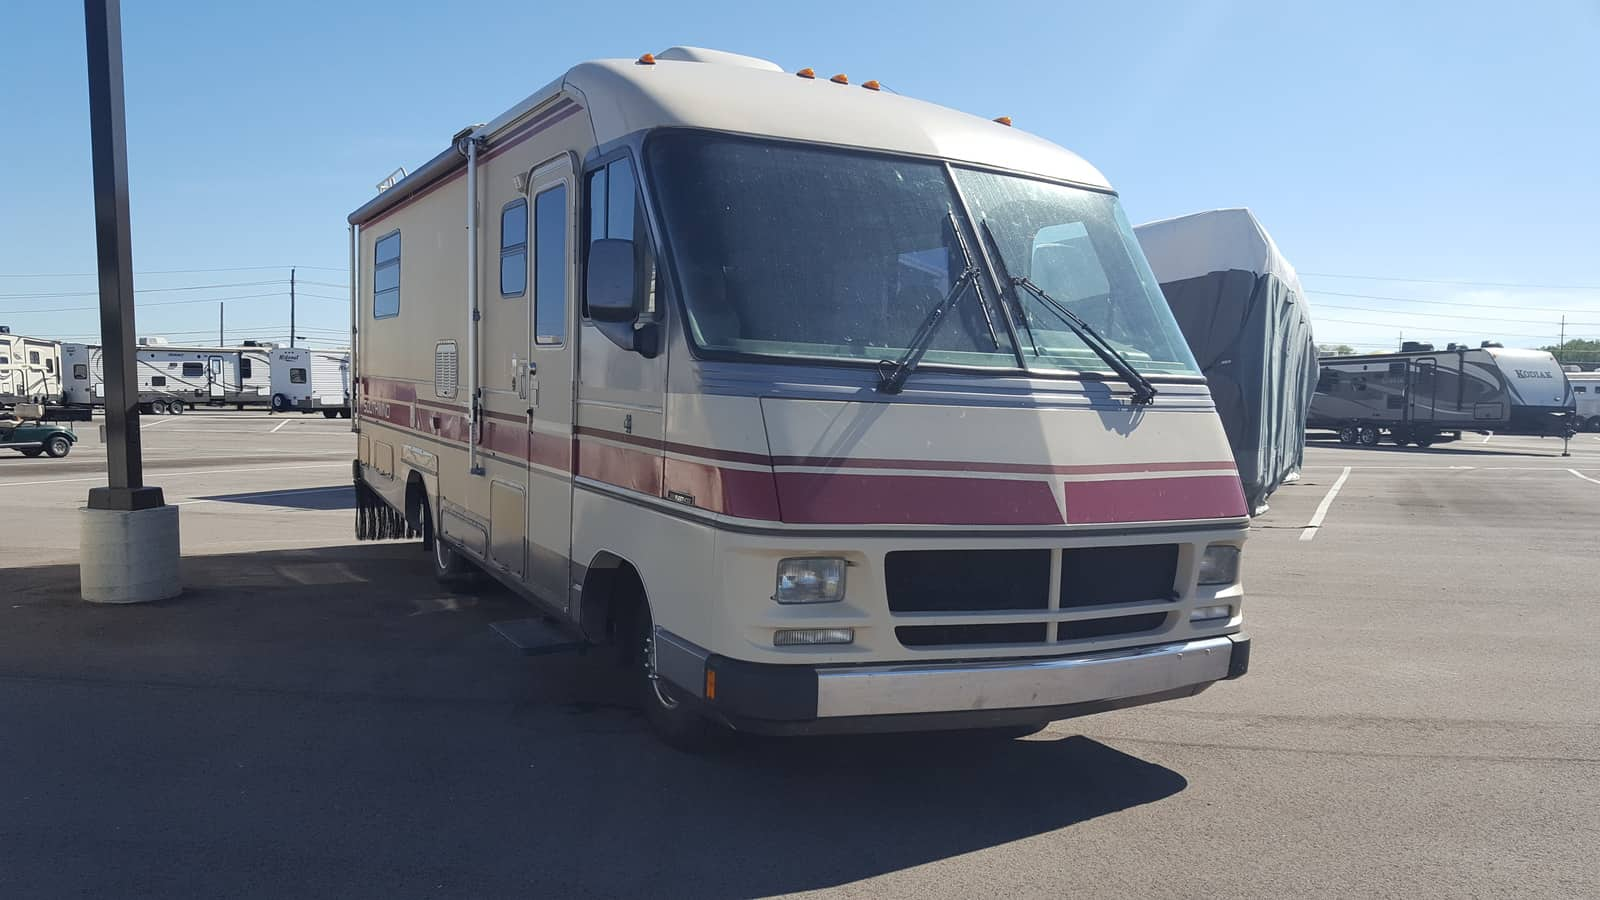 USED 1988 Fleetwood SOUTHWIND 27Y - American RV